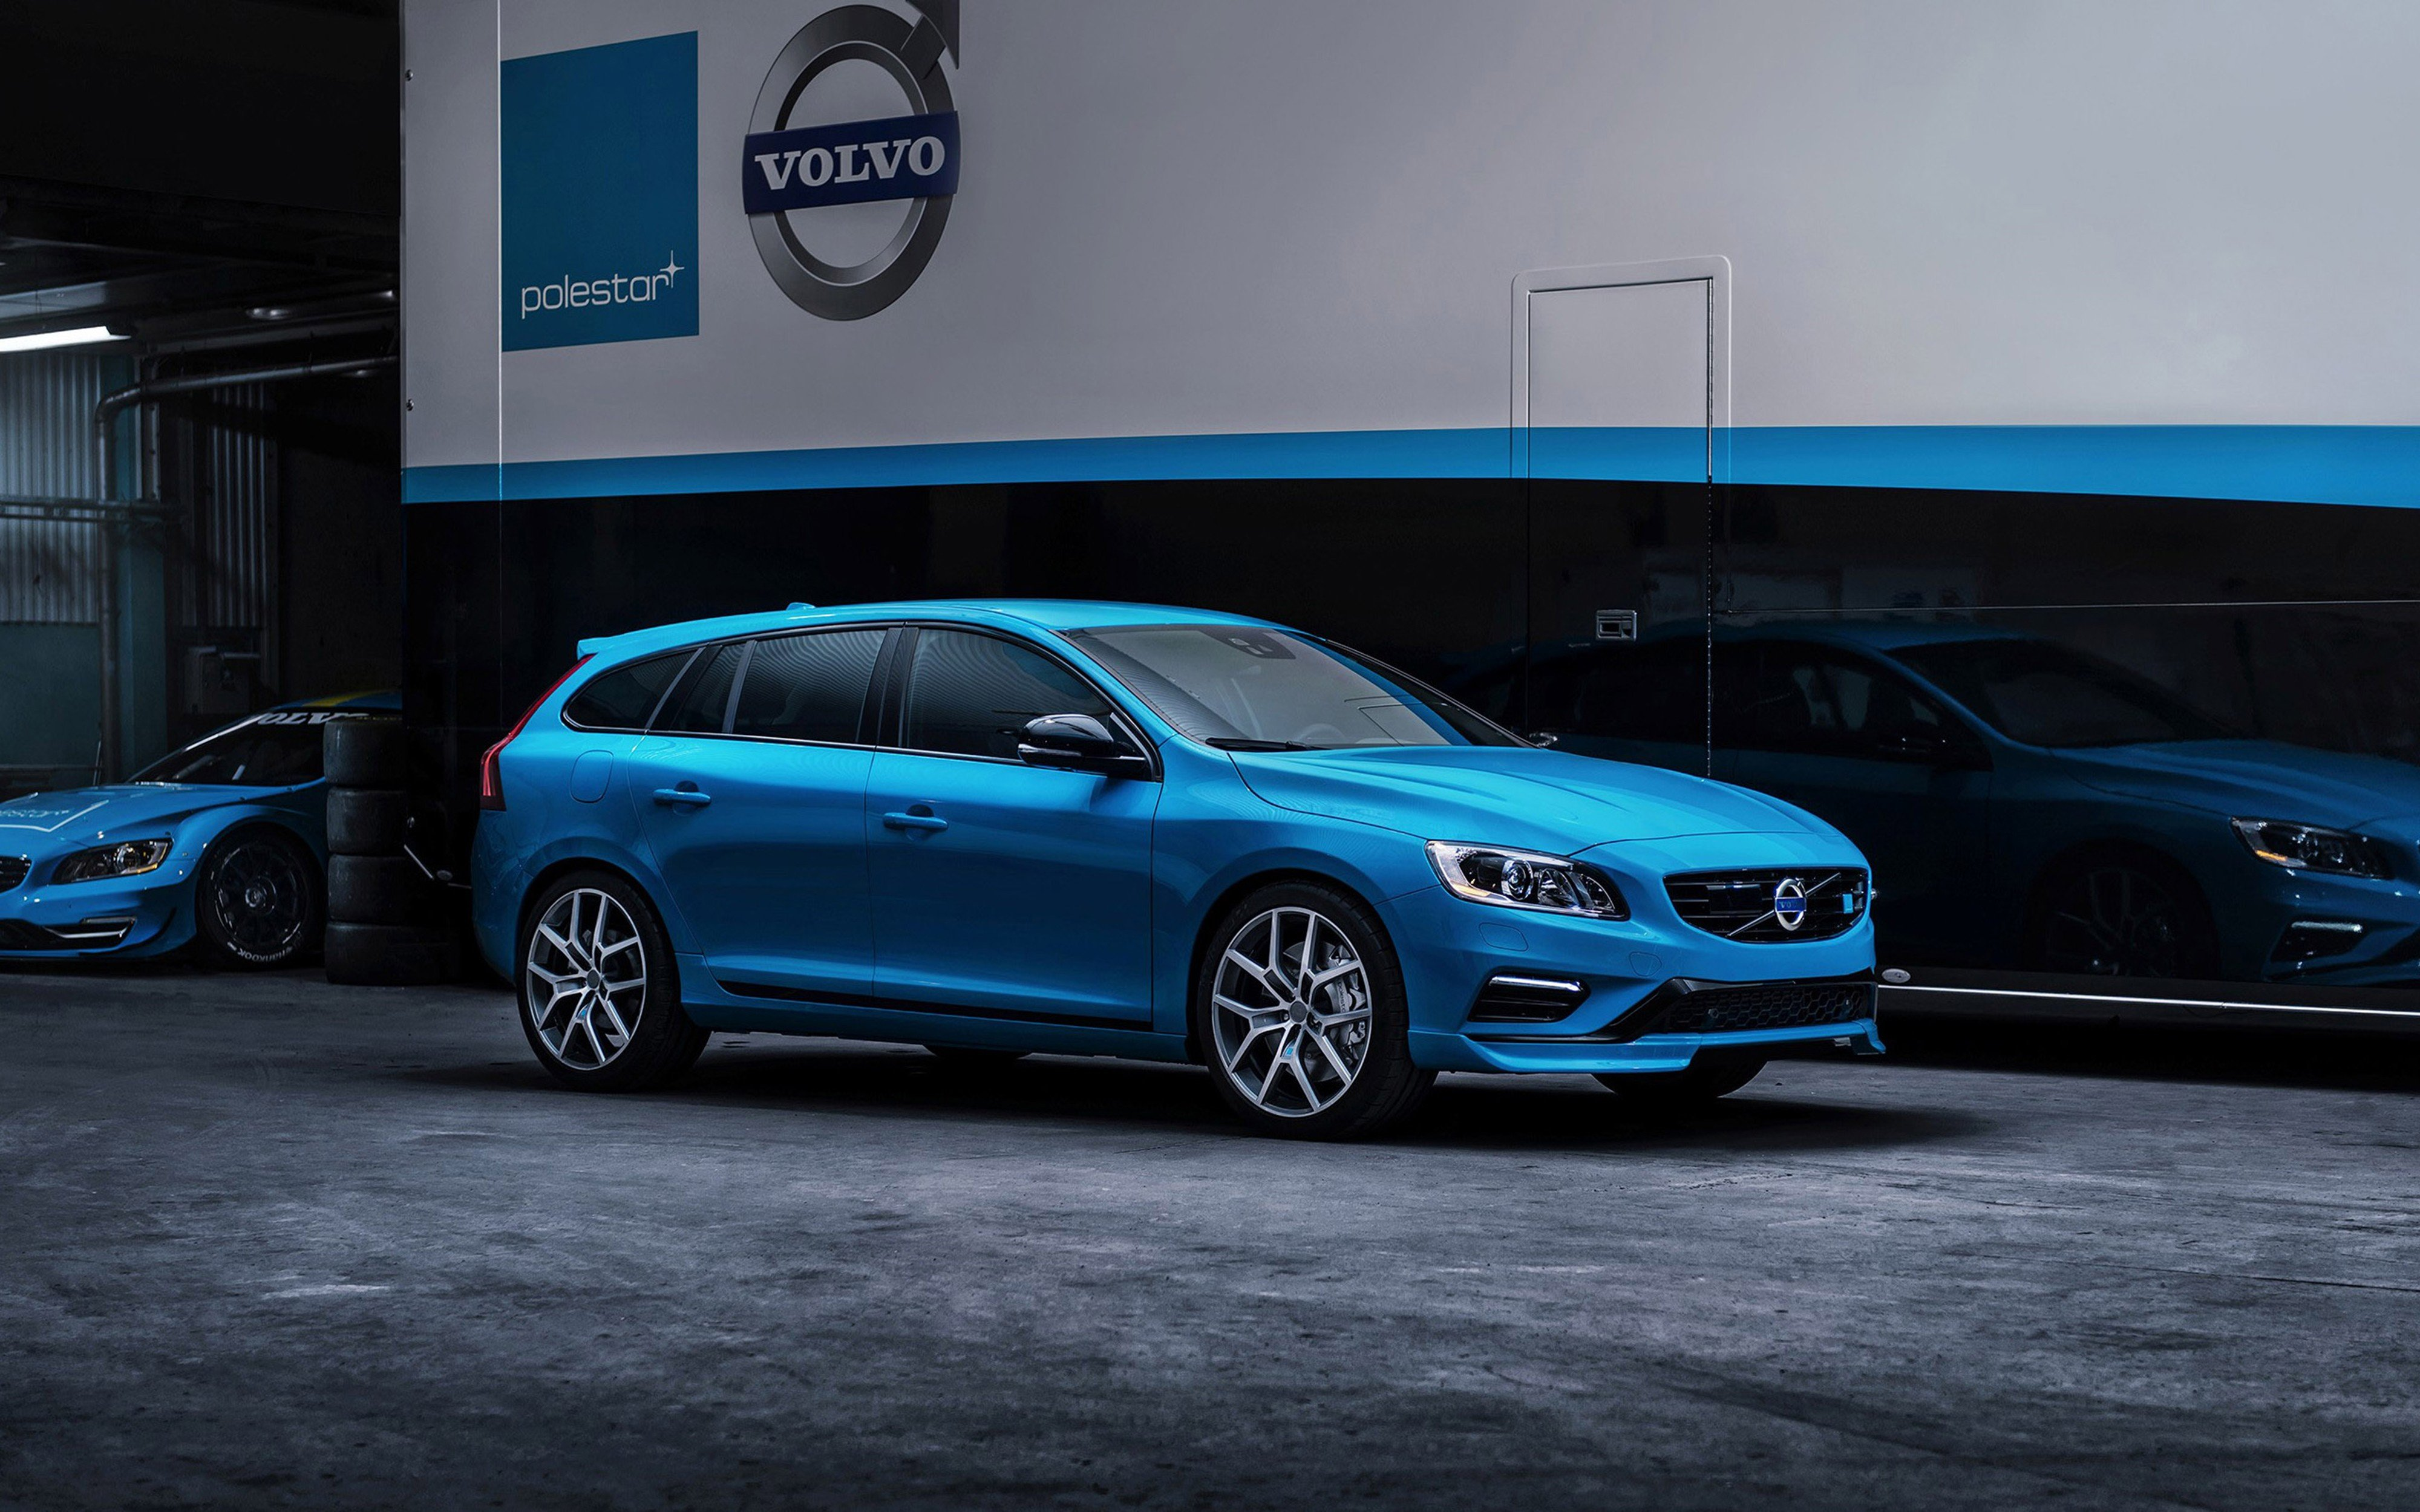 2014 Volvo V60 Polestar Car Vehicle blue 4000x2500 (2) wallpaper | 4000x2500 | 382547 | WallpaperUP